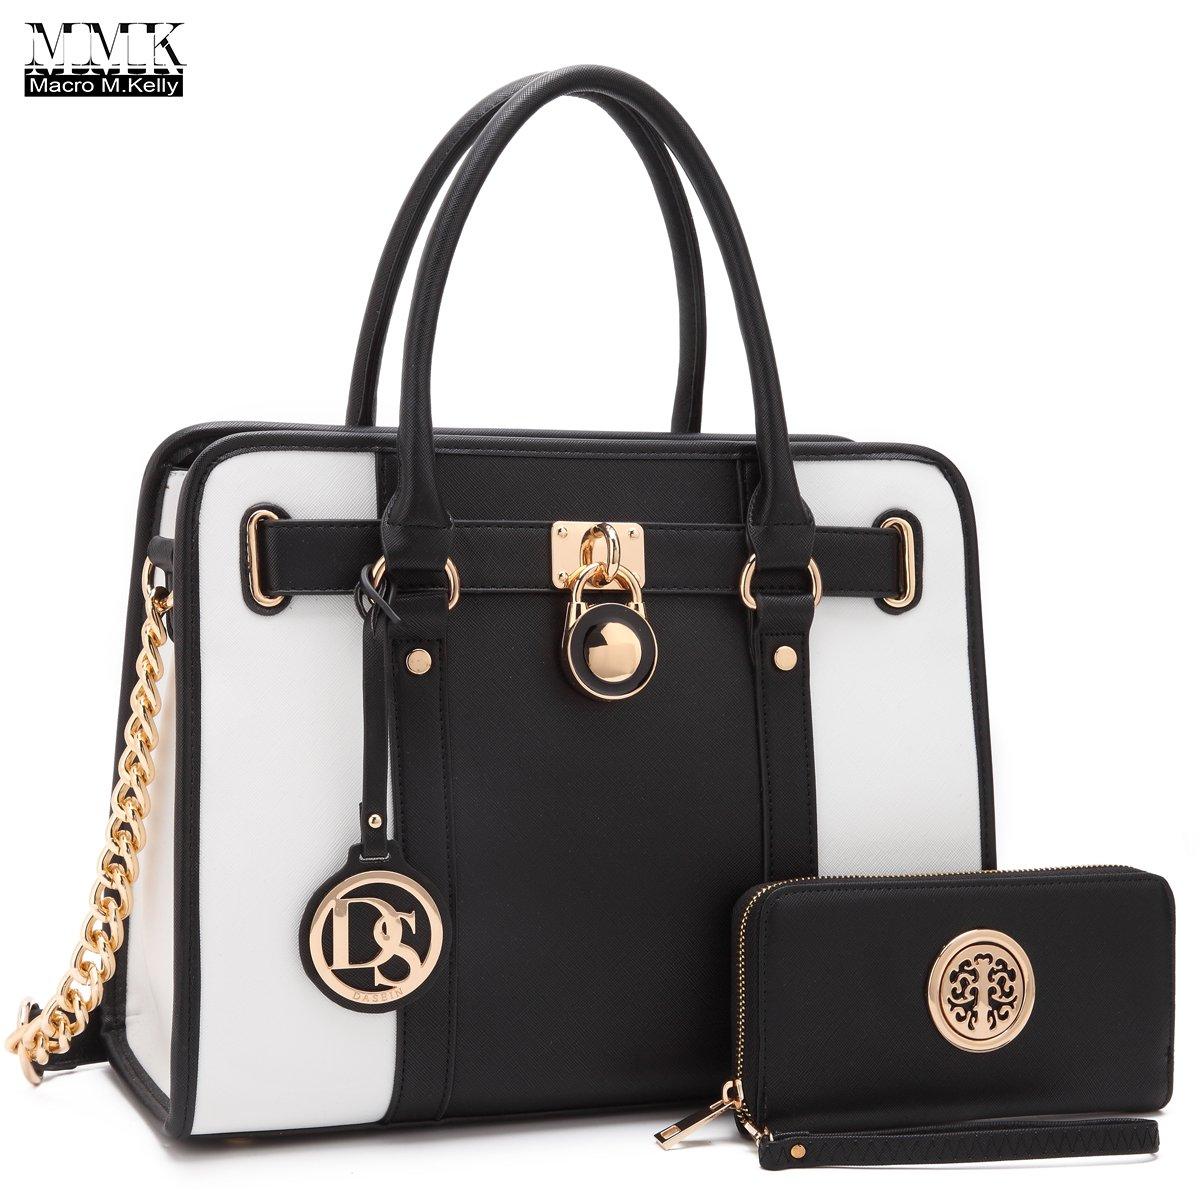 MMK collection Fashion Handbag with coin purse(XL-11) Classic Women Purse Handbag for Women` Signature fashion Designer Purse ~ Perfect Women Satchel Purse (XL-02-7103W-BK/WT)